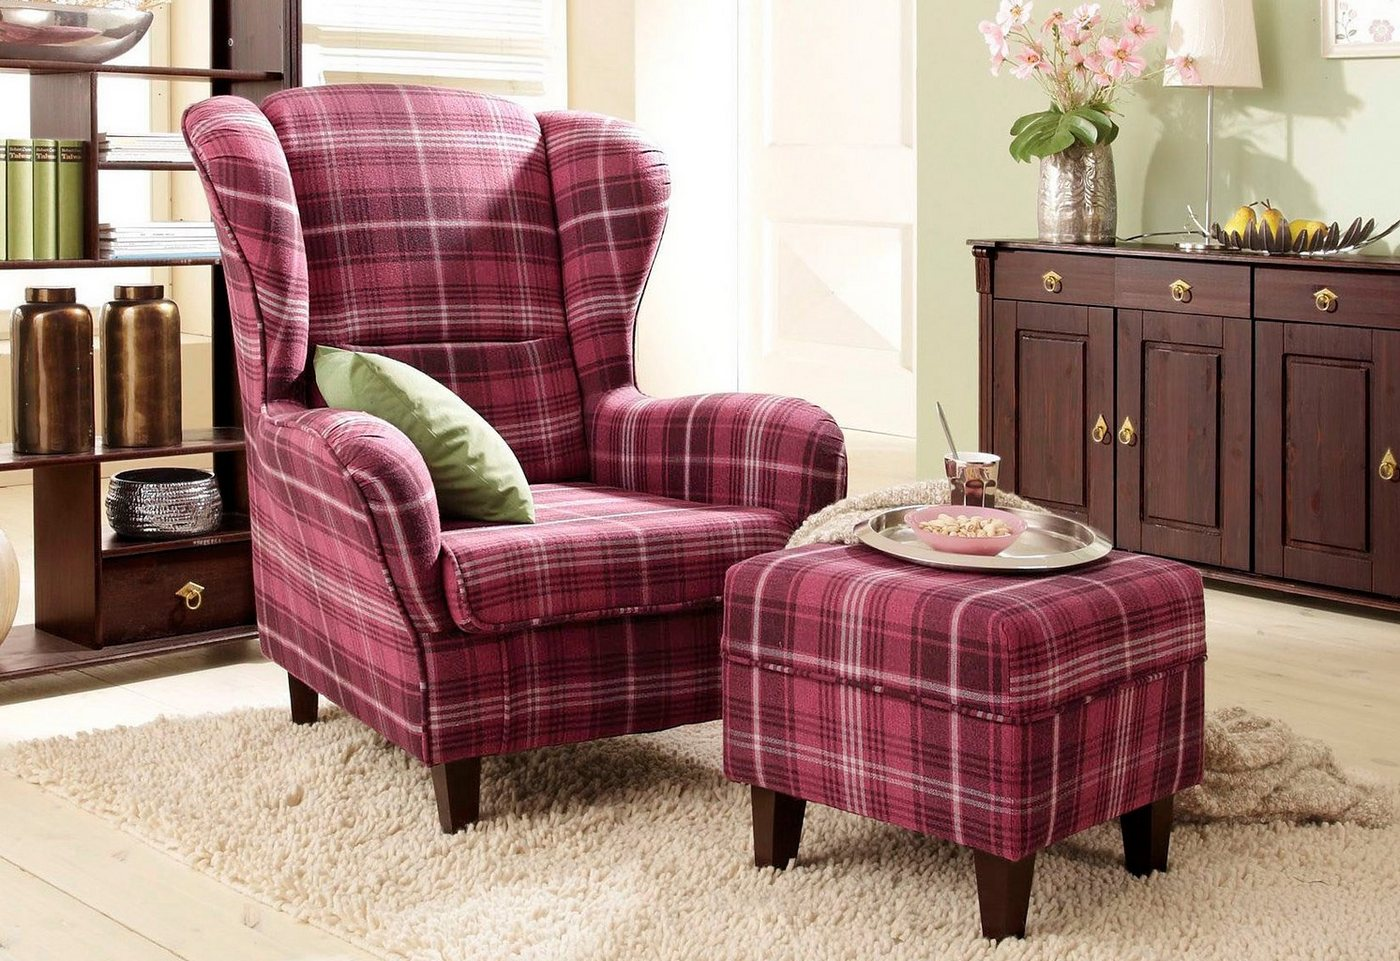 landhausstil ohrensessel preisvergleiche. Black Bedroom Furniture Sets. Home Design Ideas